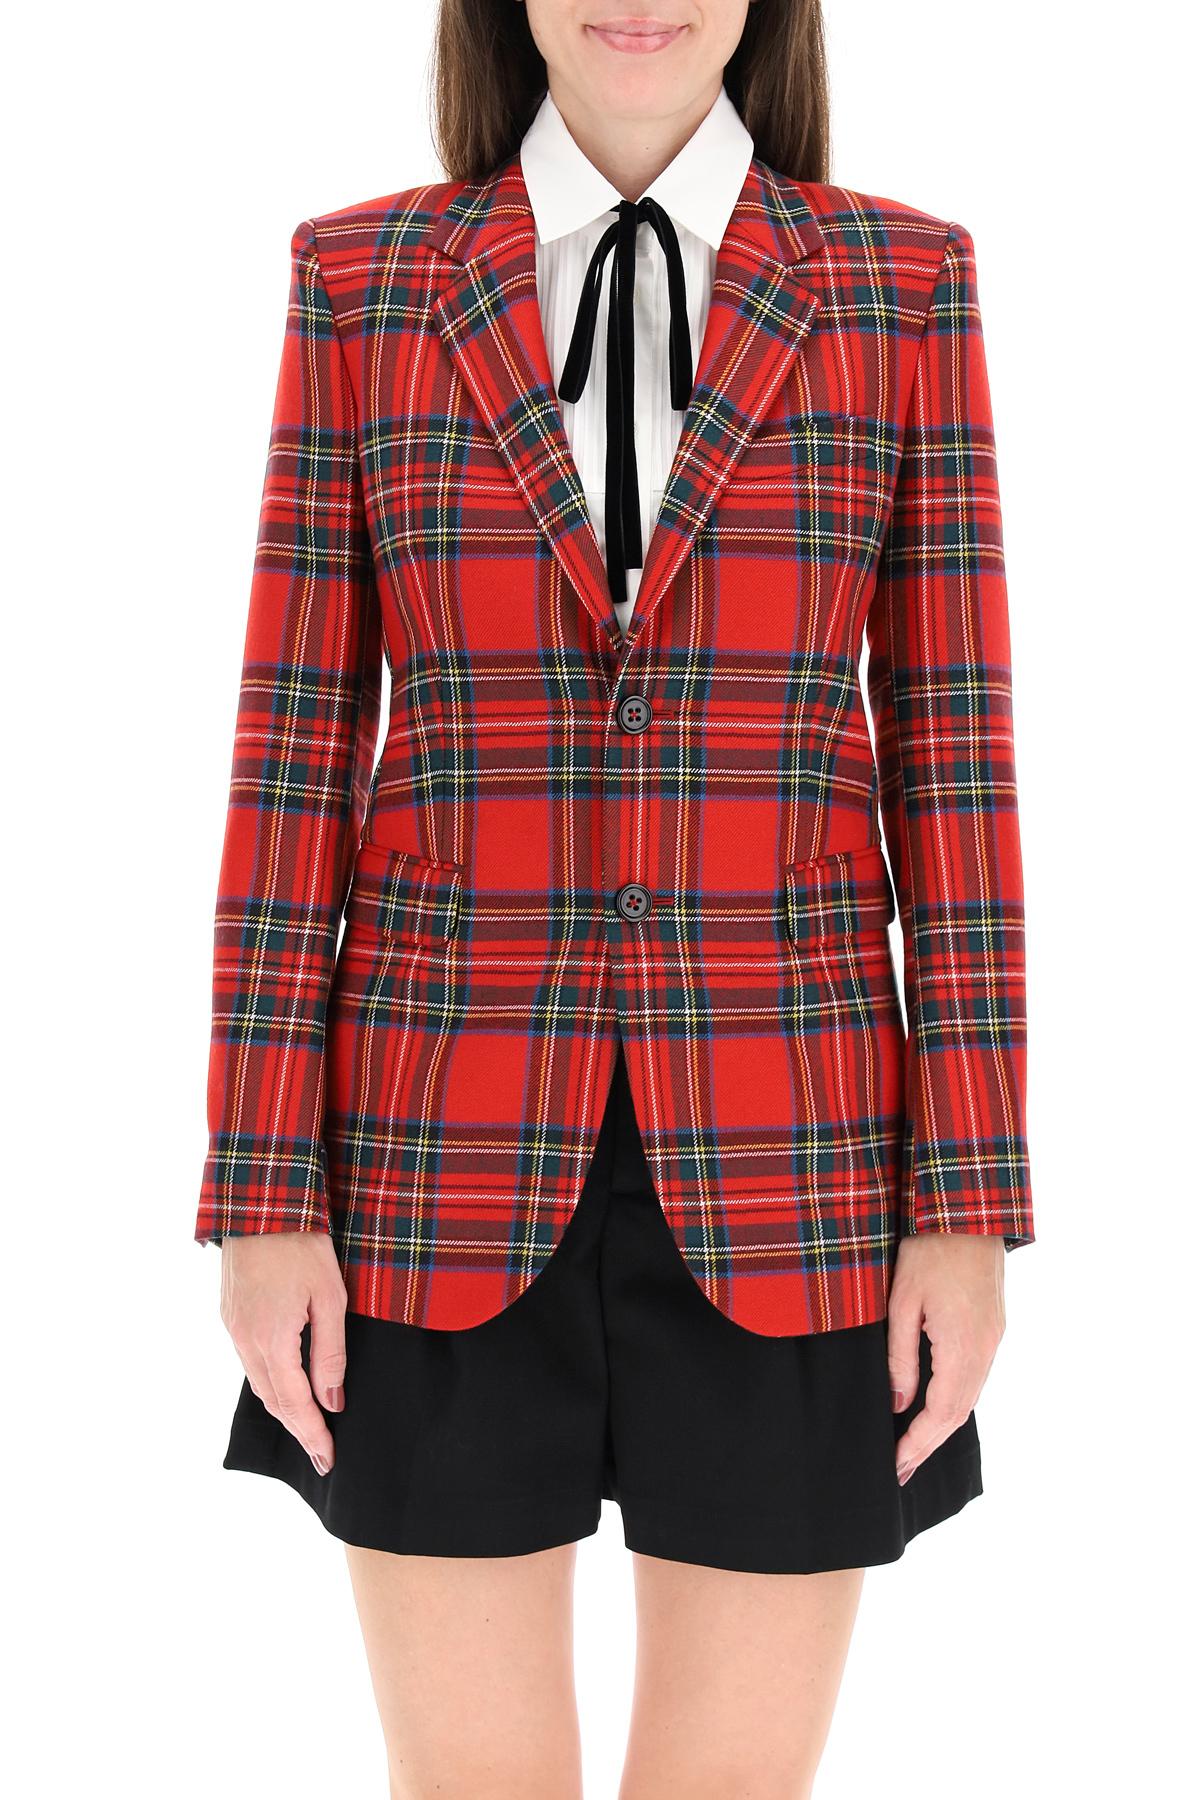 Red valentino giacca in lana tartan